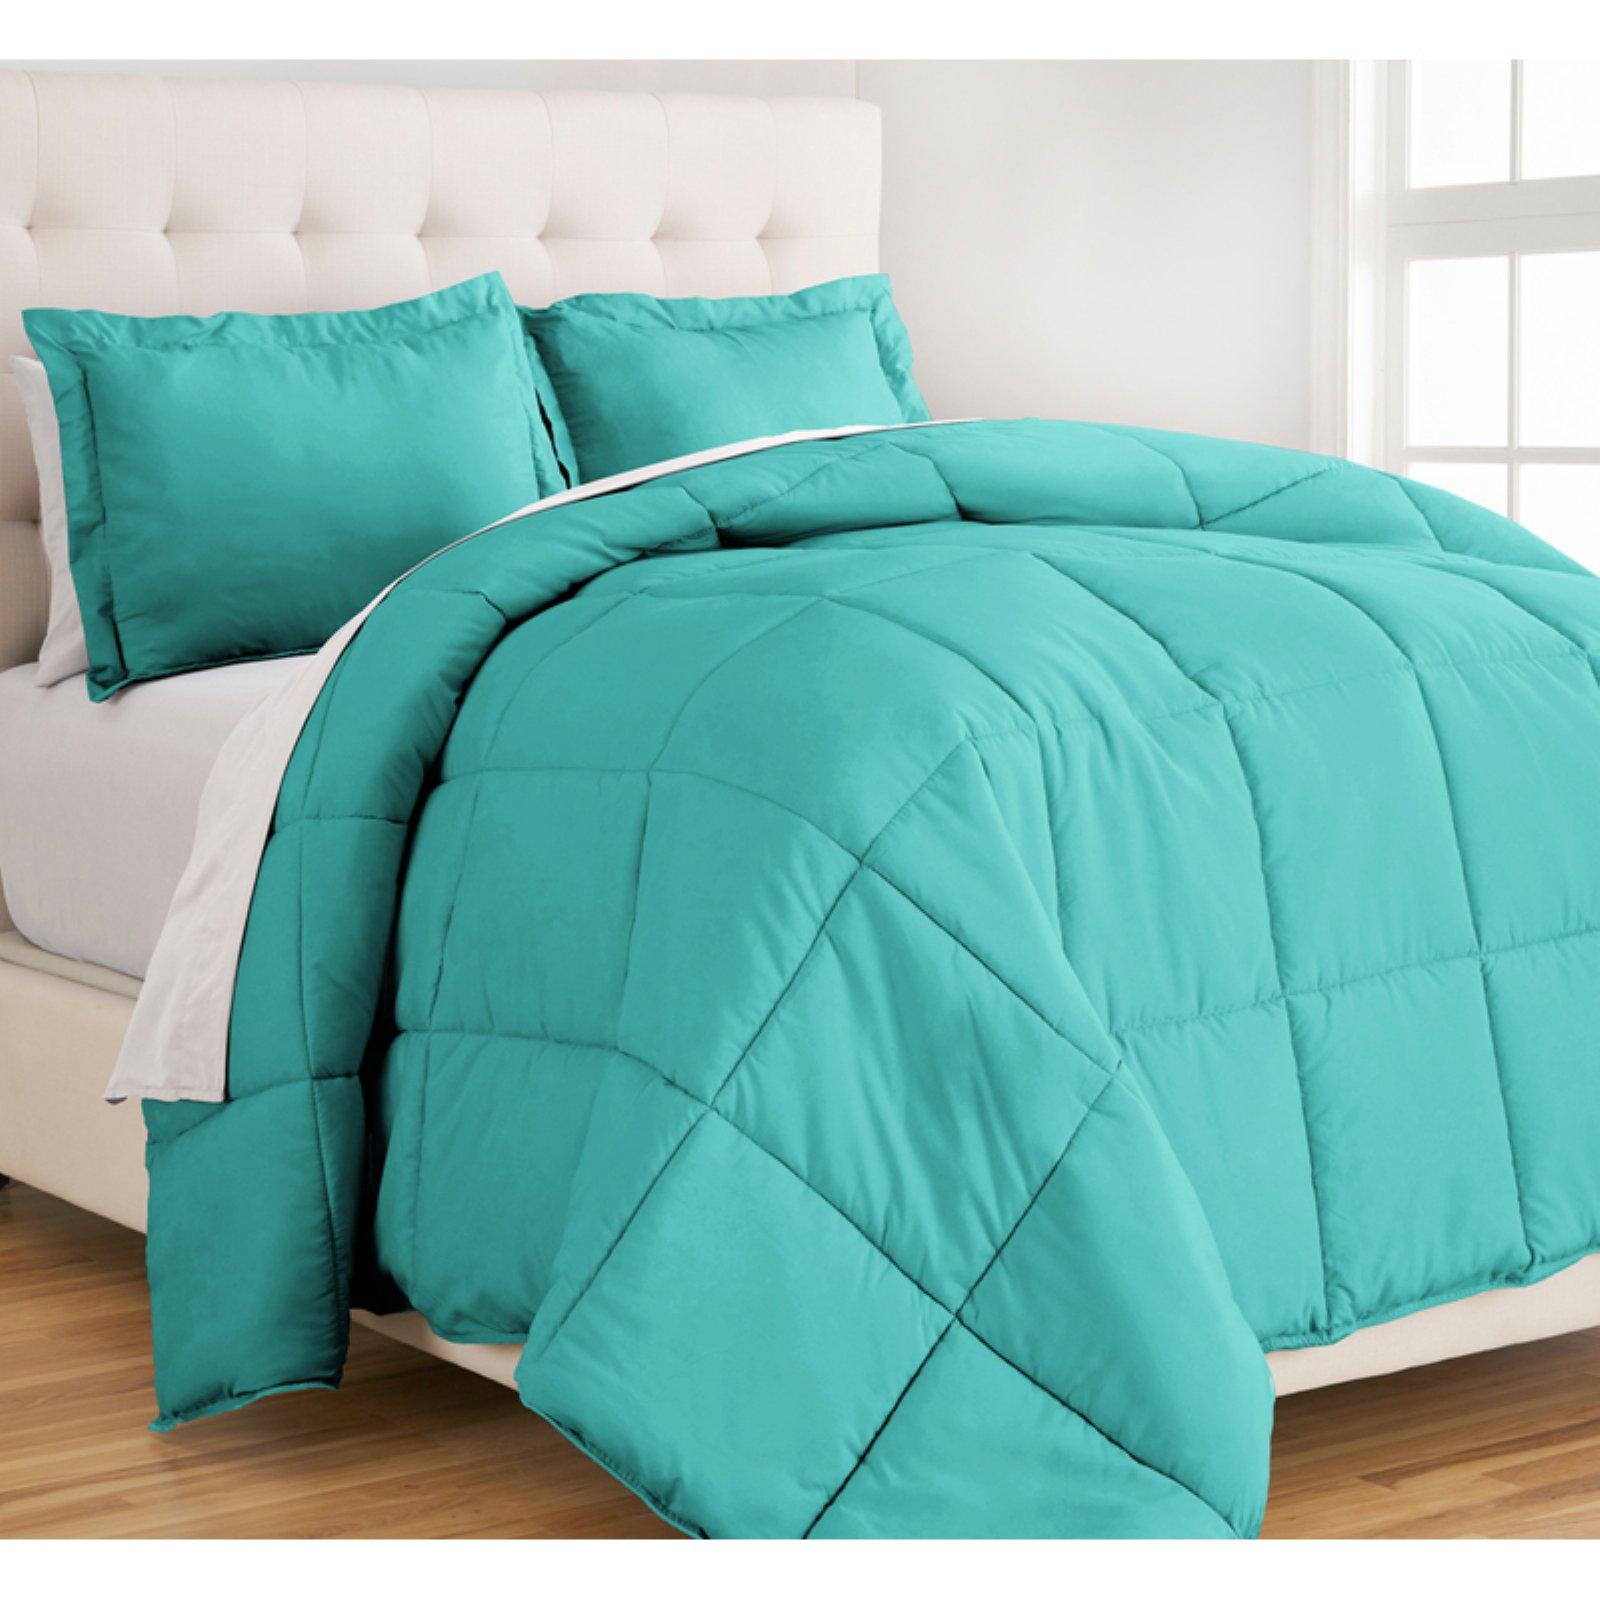 Bare Home Ultra-Soft Hypoallergenic Down Alternative Comforter Set